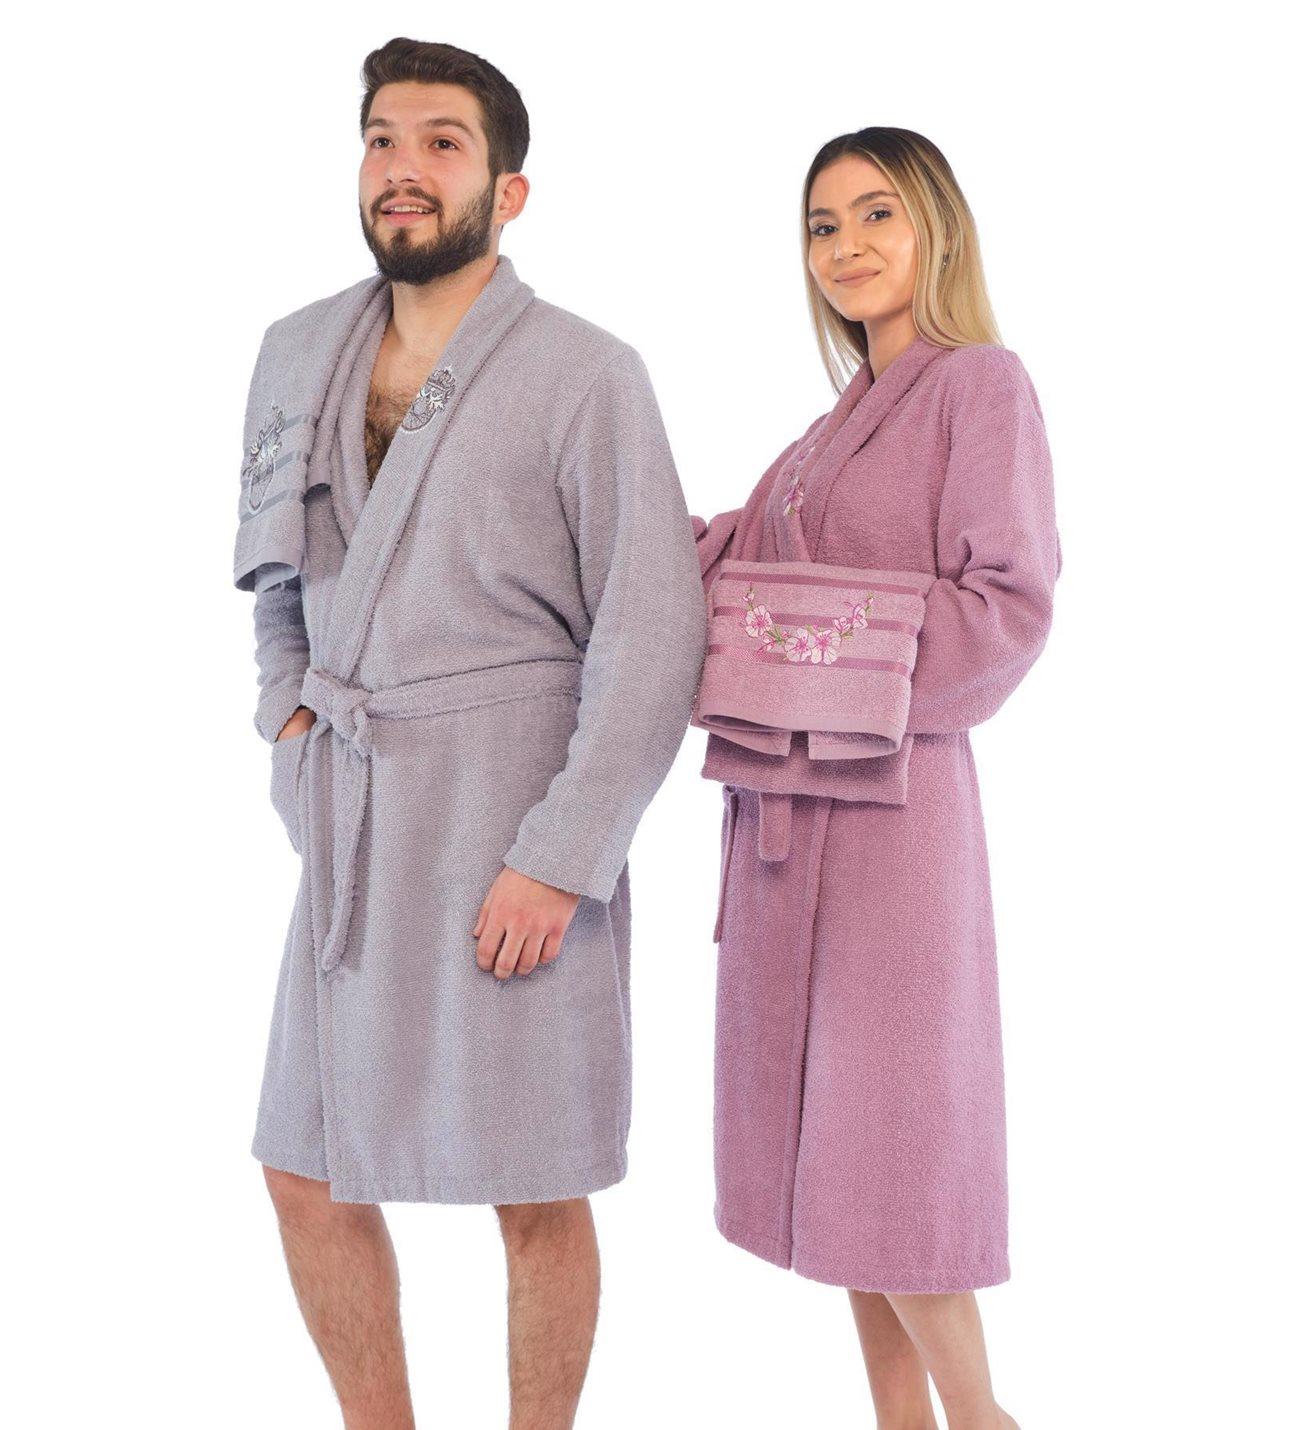 Men-Women Embroidered Bathrobe Set Cotton Extra Soft 4 Piece Bathrobe Set Made of Turkish Quality Cotton